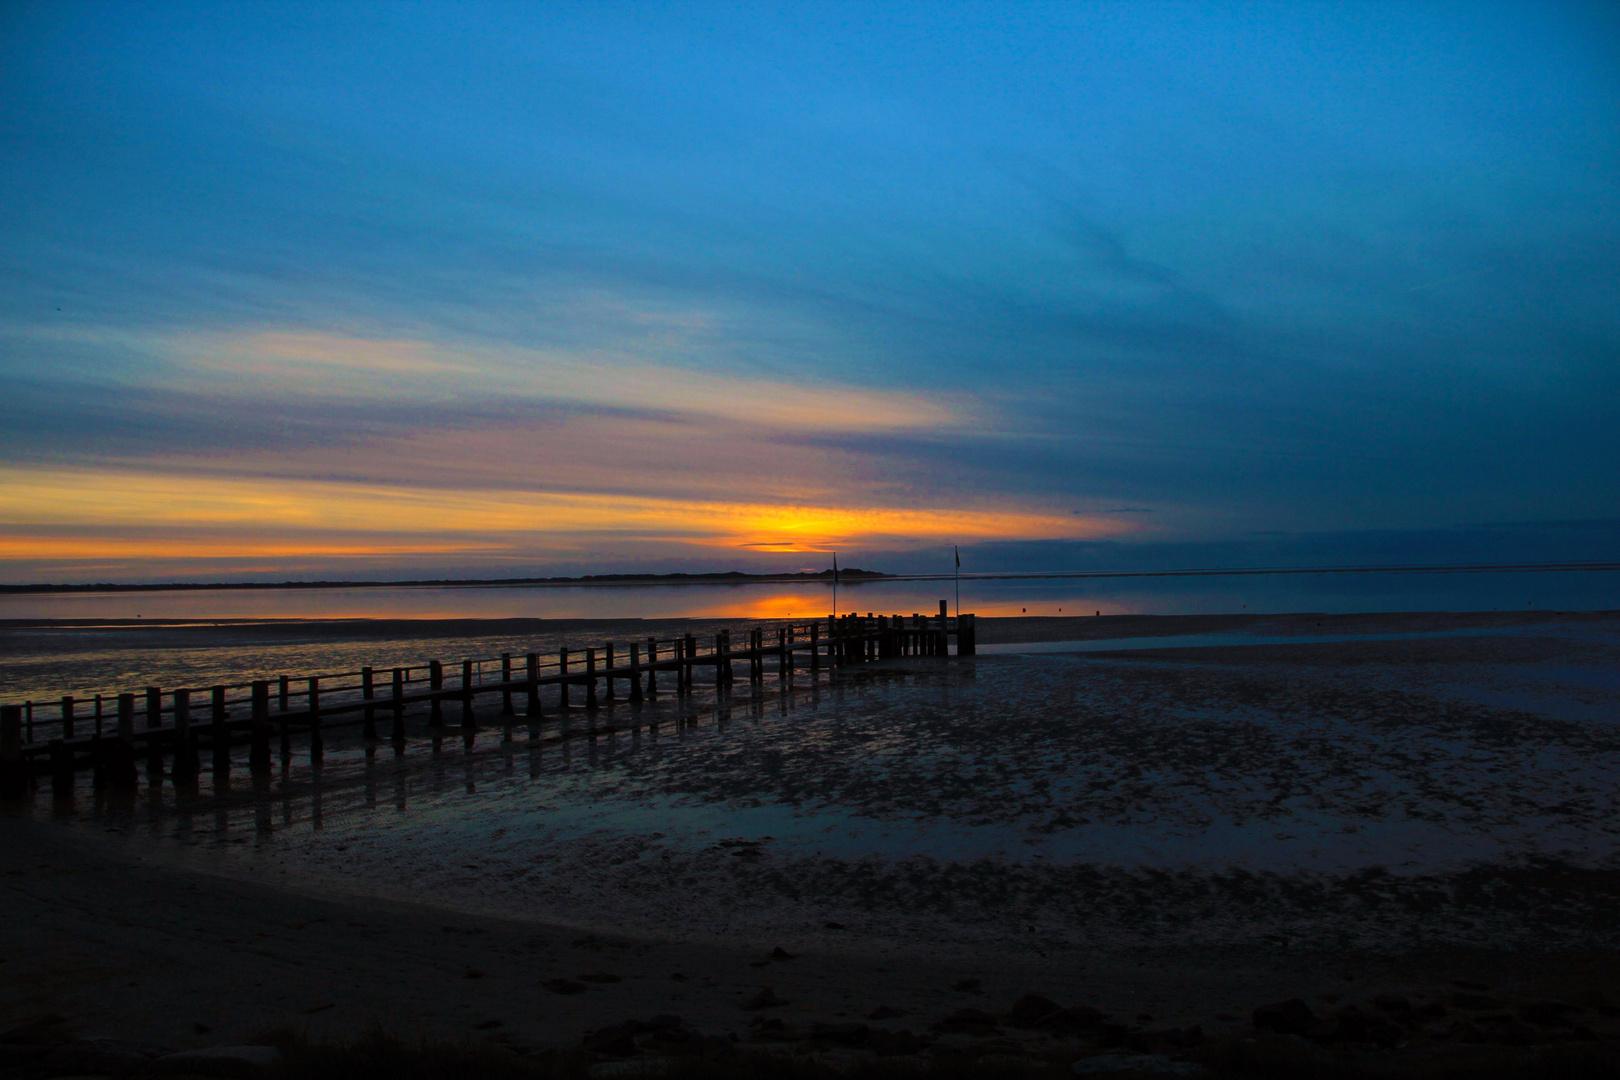 Sonnenuntergang auf Föhr